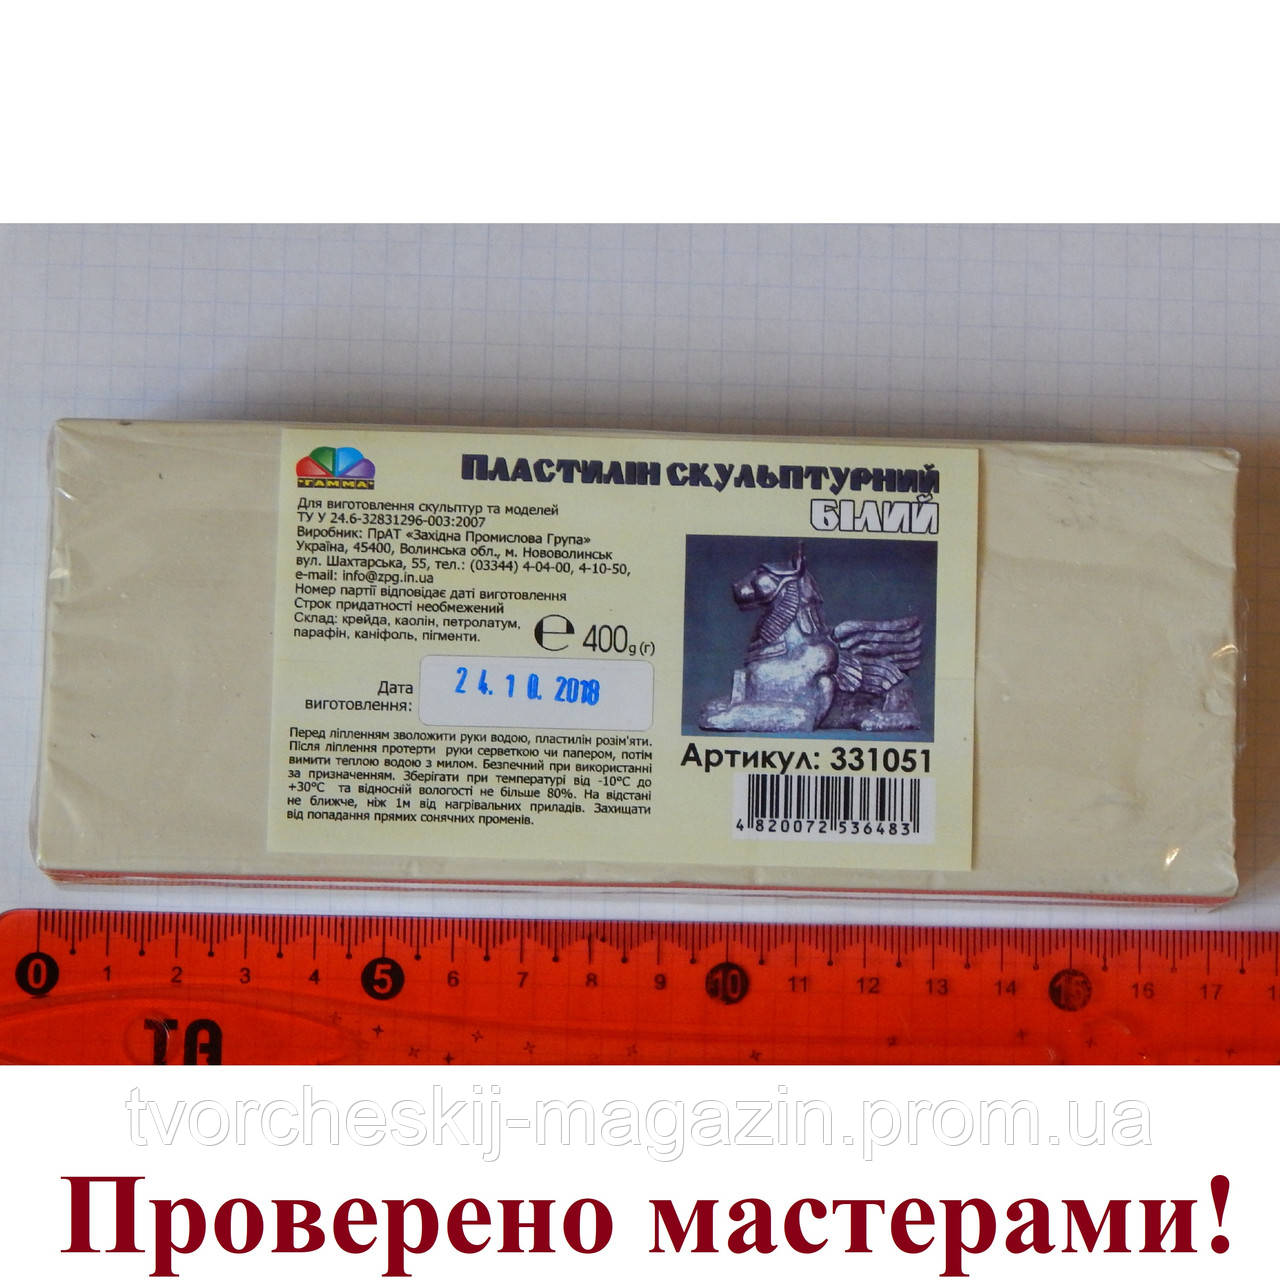 Пластилин ''Скульптурный'', белый 400 г.